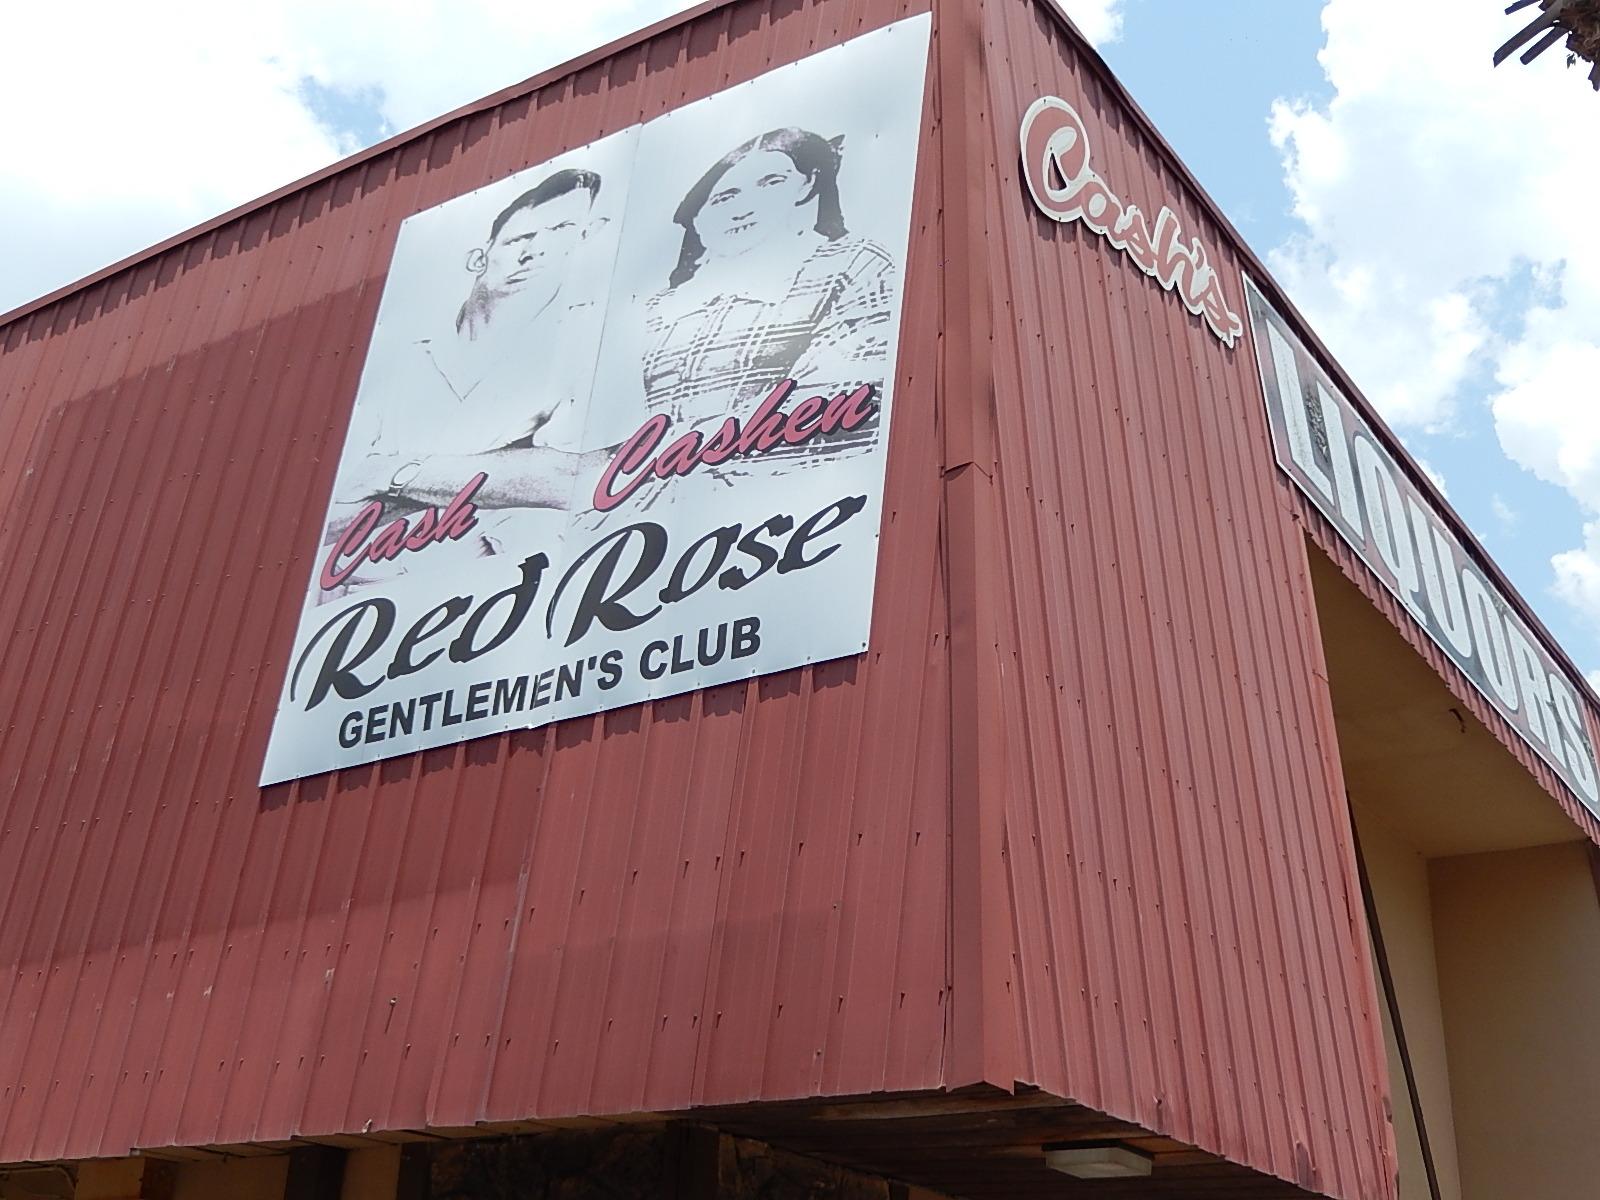 Red rose fort walton beach